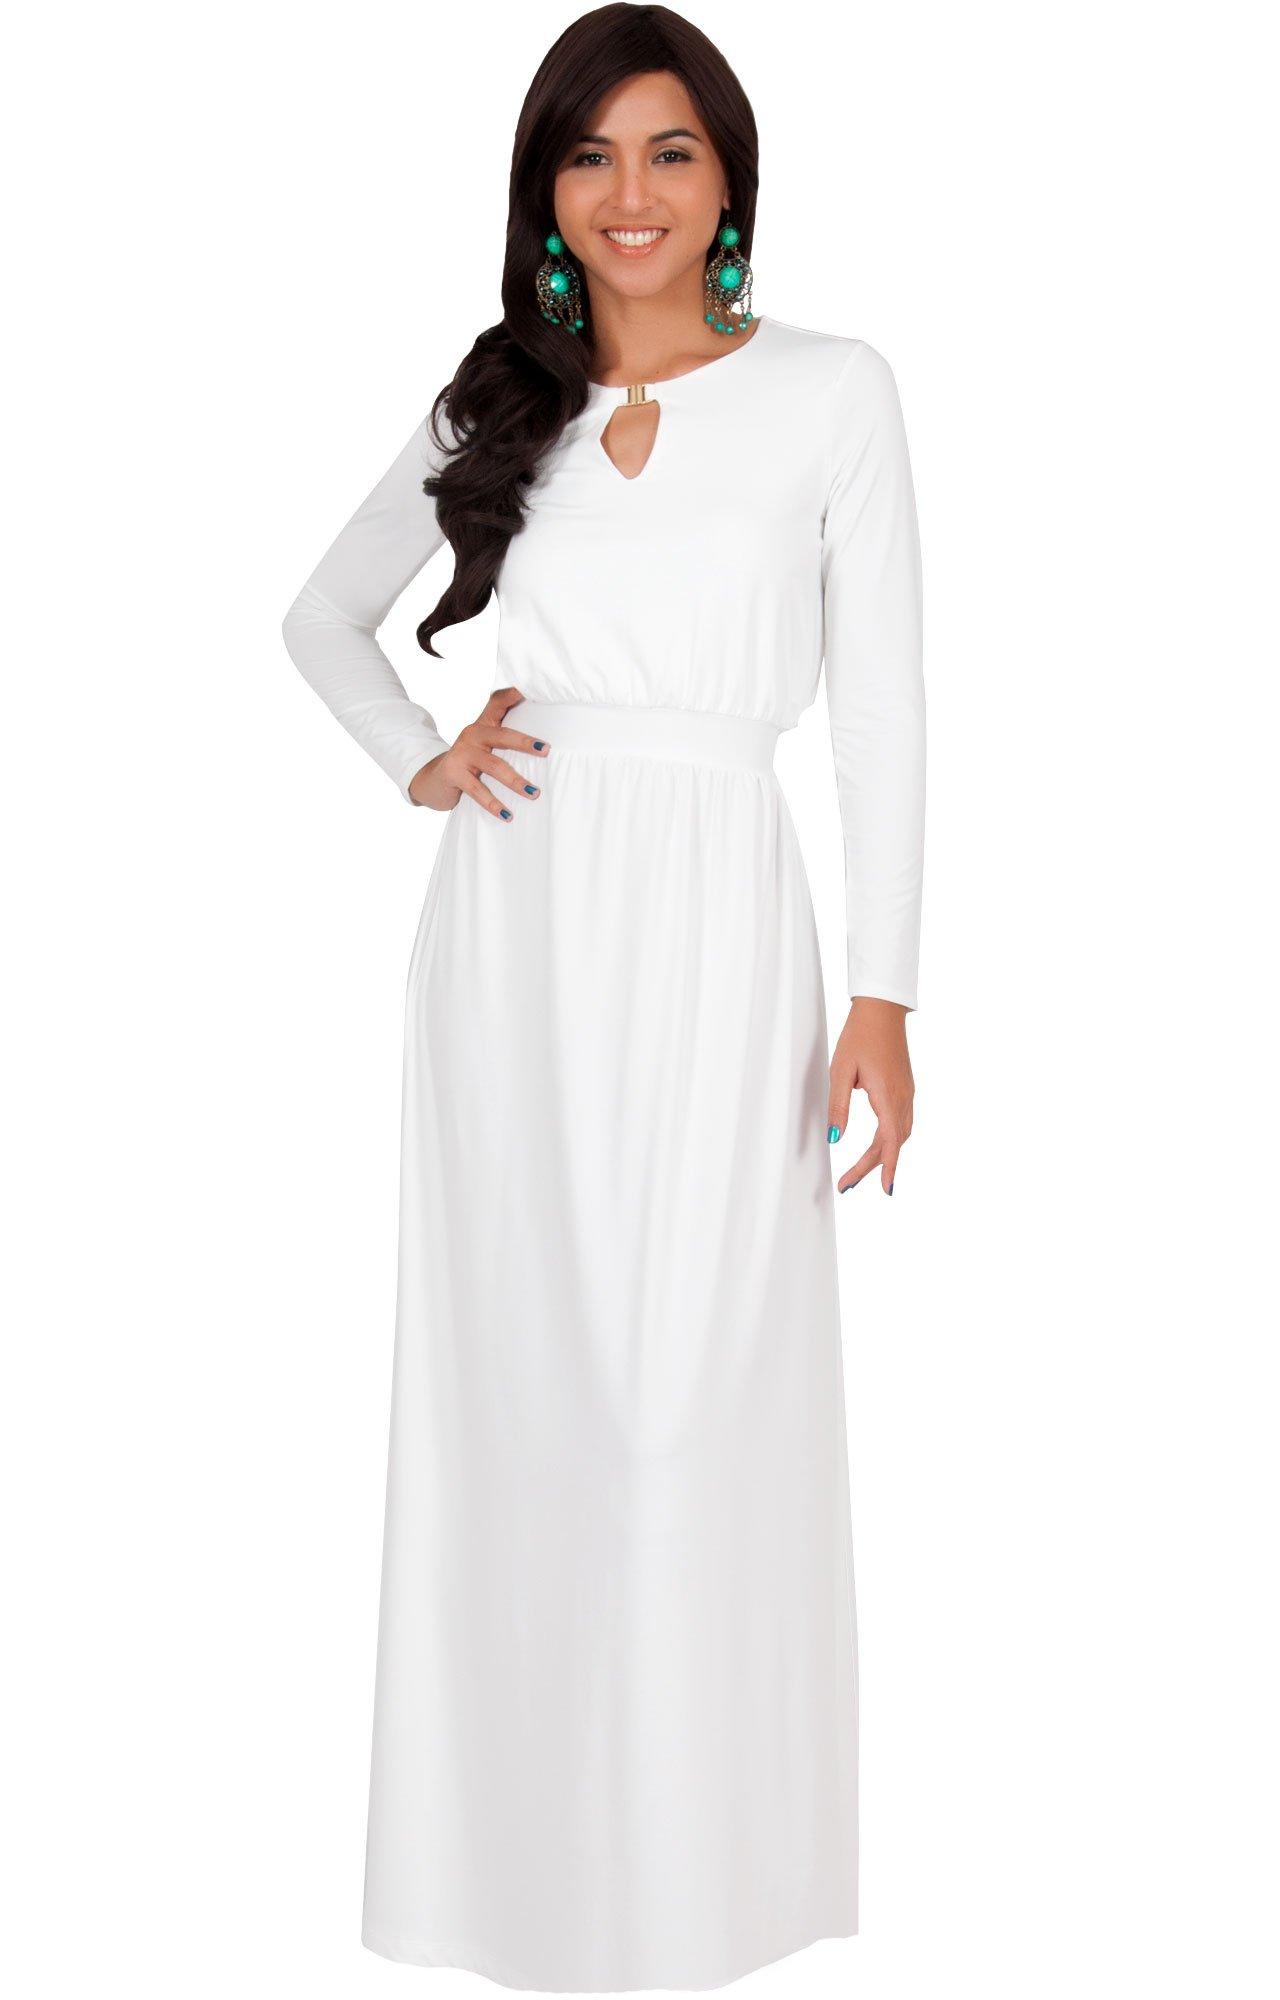 79f3b66b04 KOH KOH Petite Womens Long Sleeve Sleeves Modest Flowy Fall Winter Formal  Empire Waist Evening Day Work Casual Abaya Muslim Wedding Gown Gowns Maxi  Dress ...